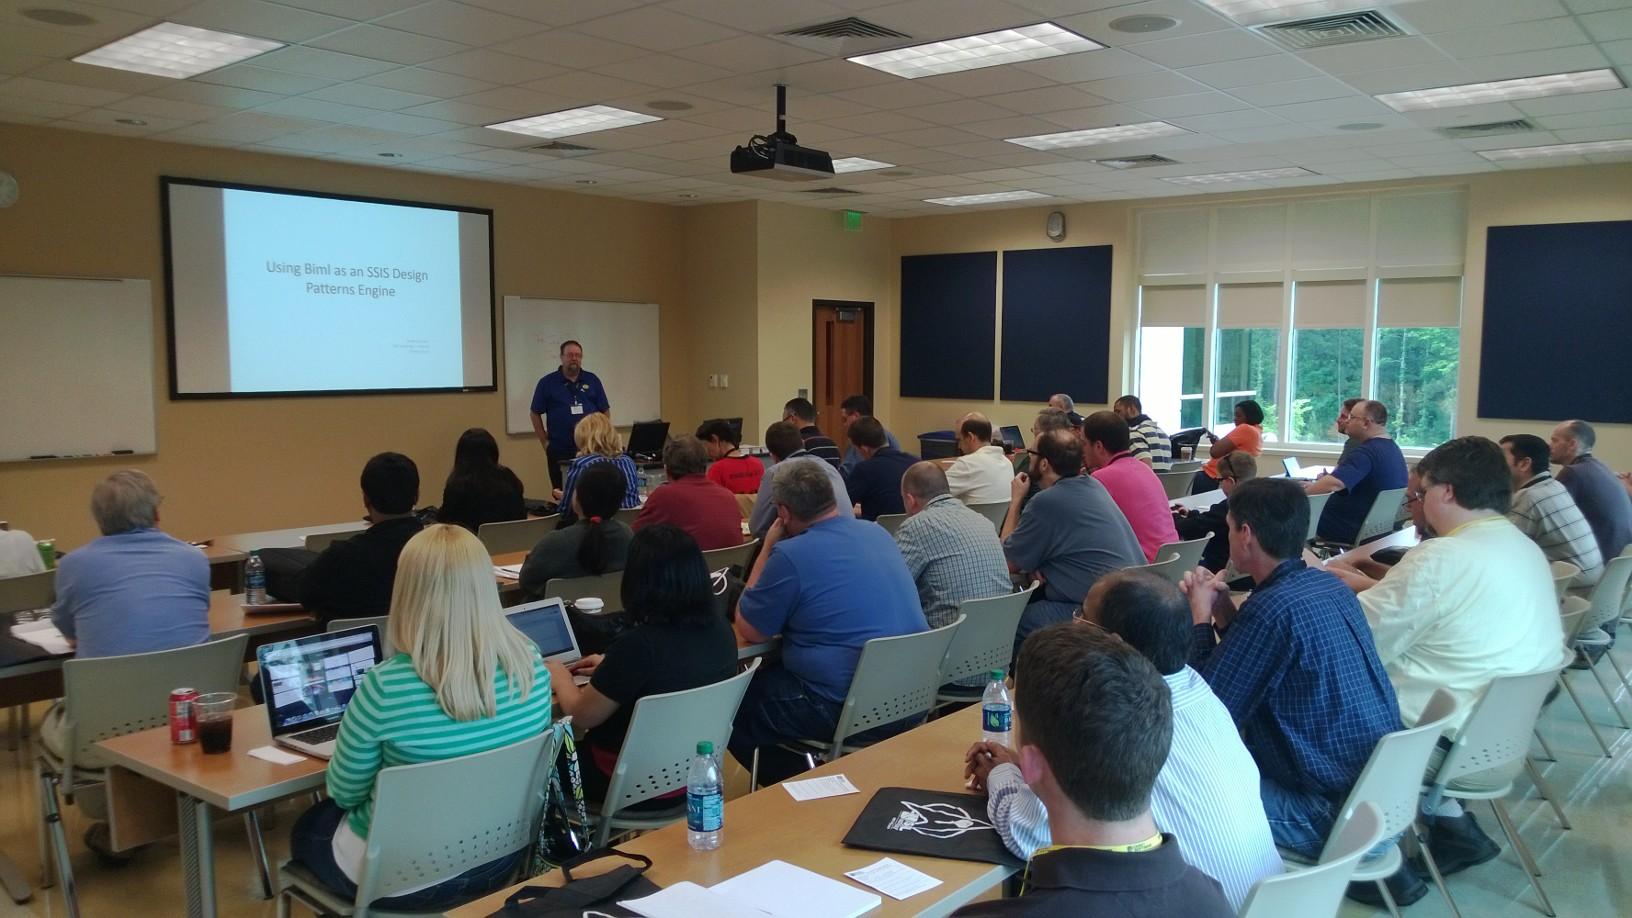 Andy Leonard's Biml Presentation